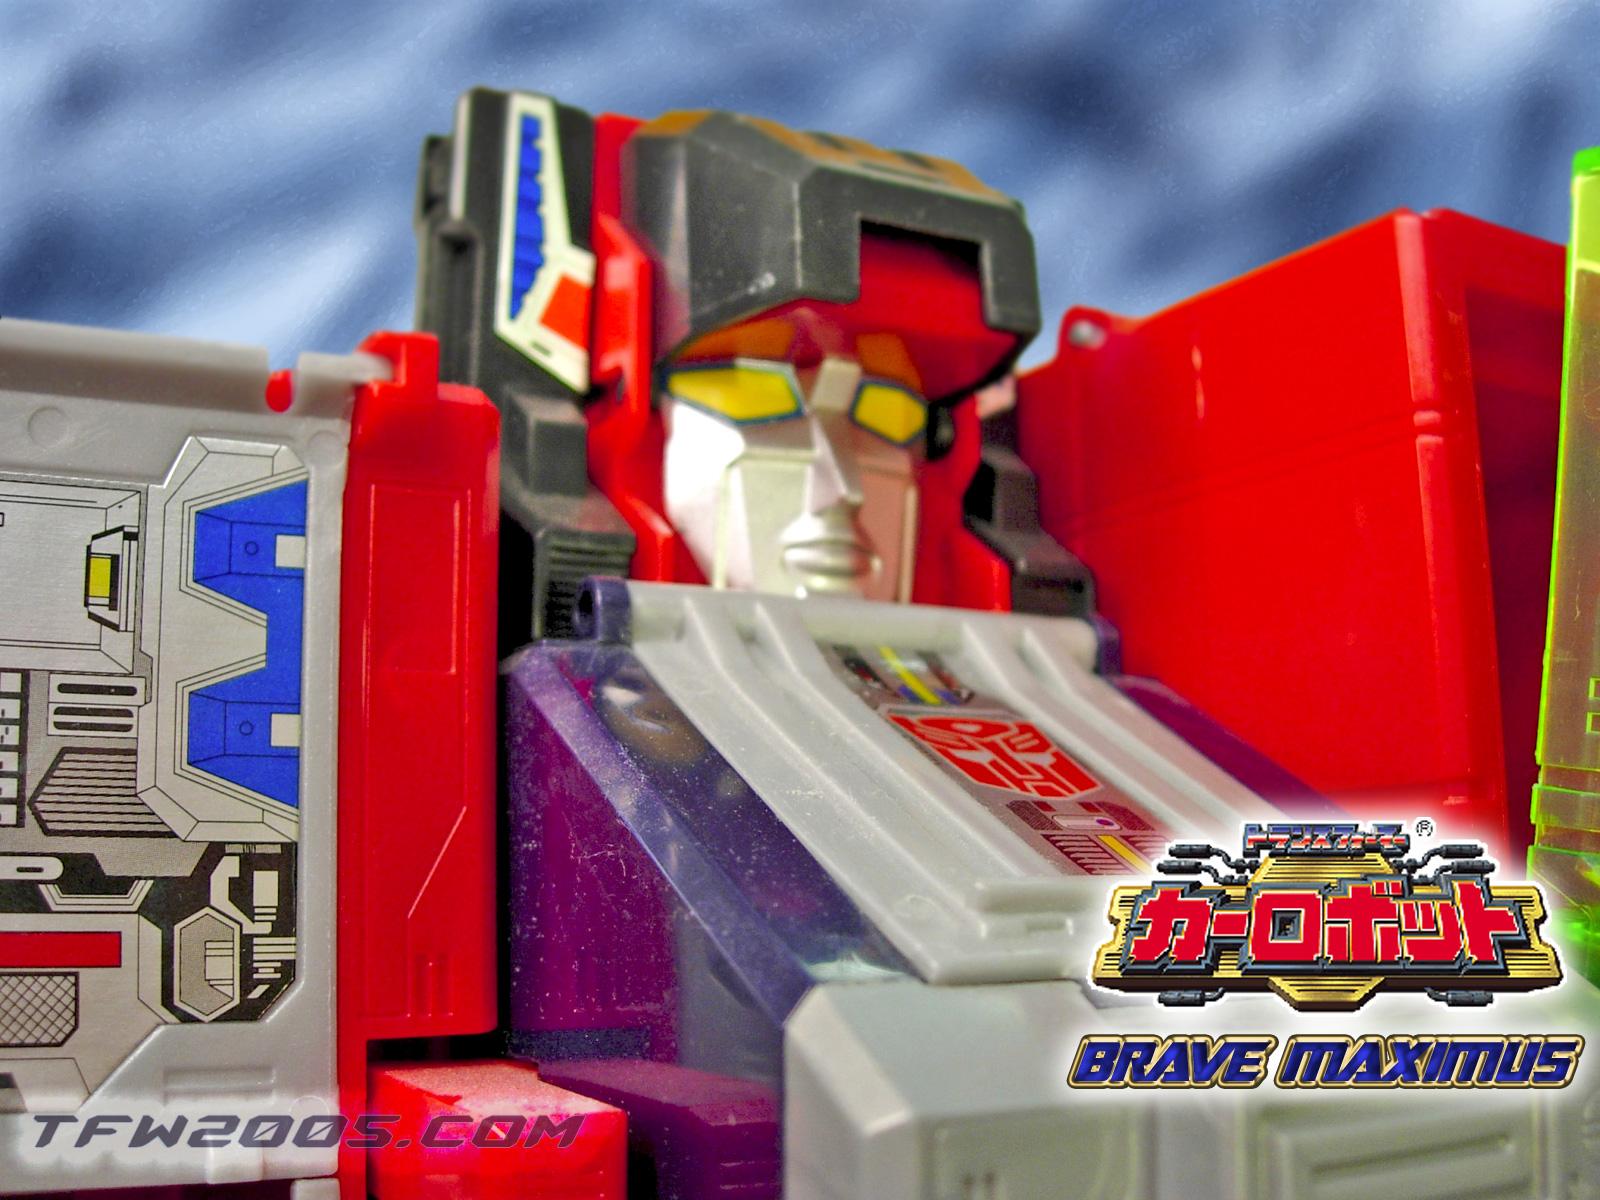 BraveMax1600